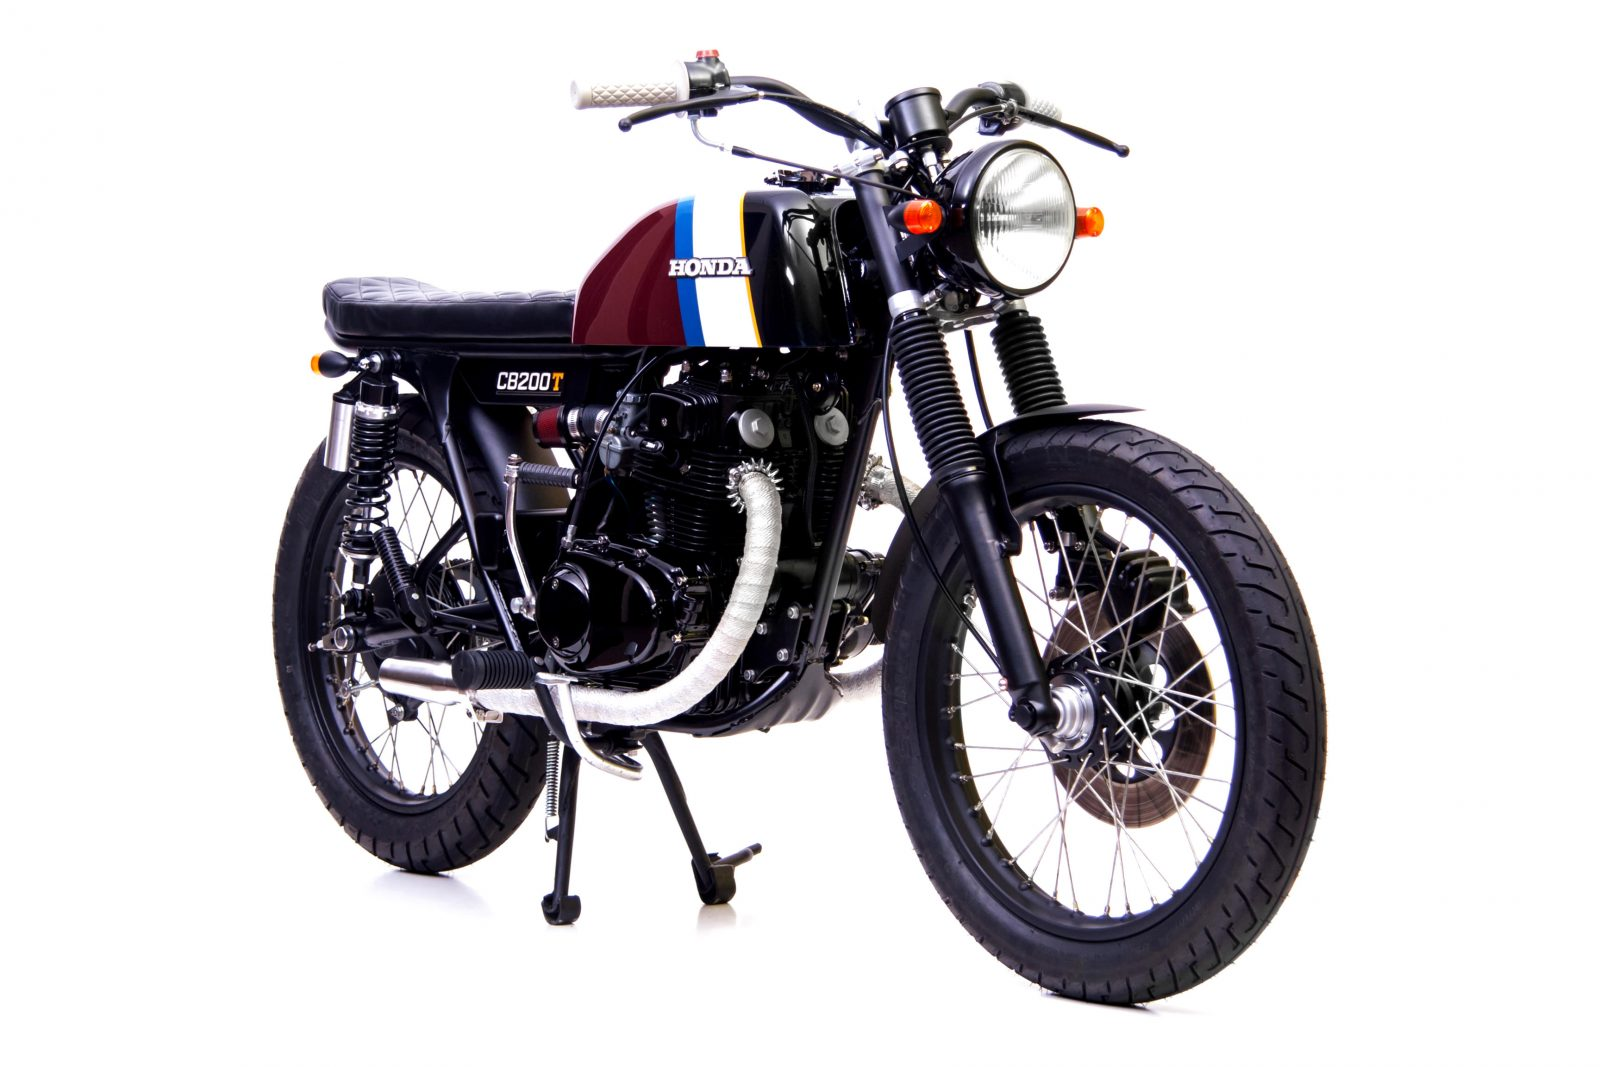 Honda CB200 5 1600x1067 - Slipstream Creations Honda CB200